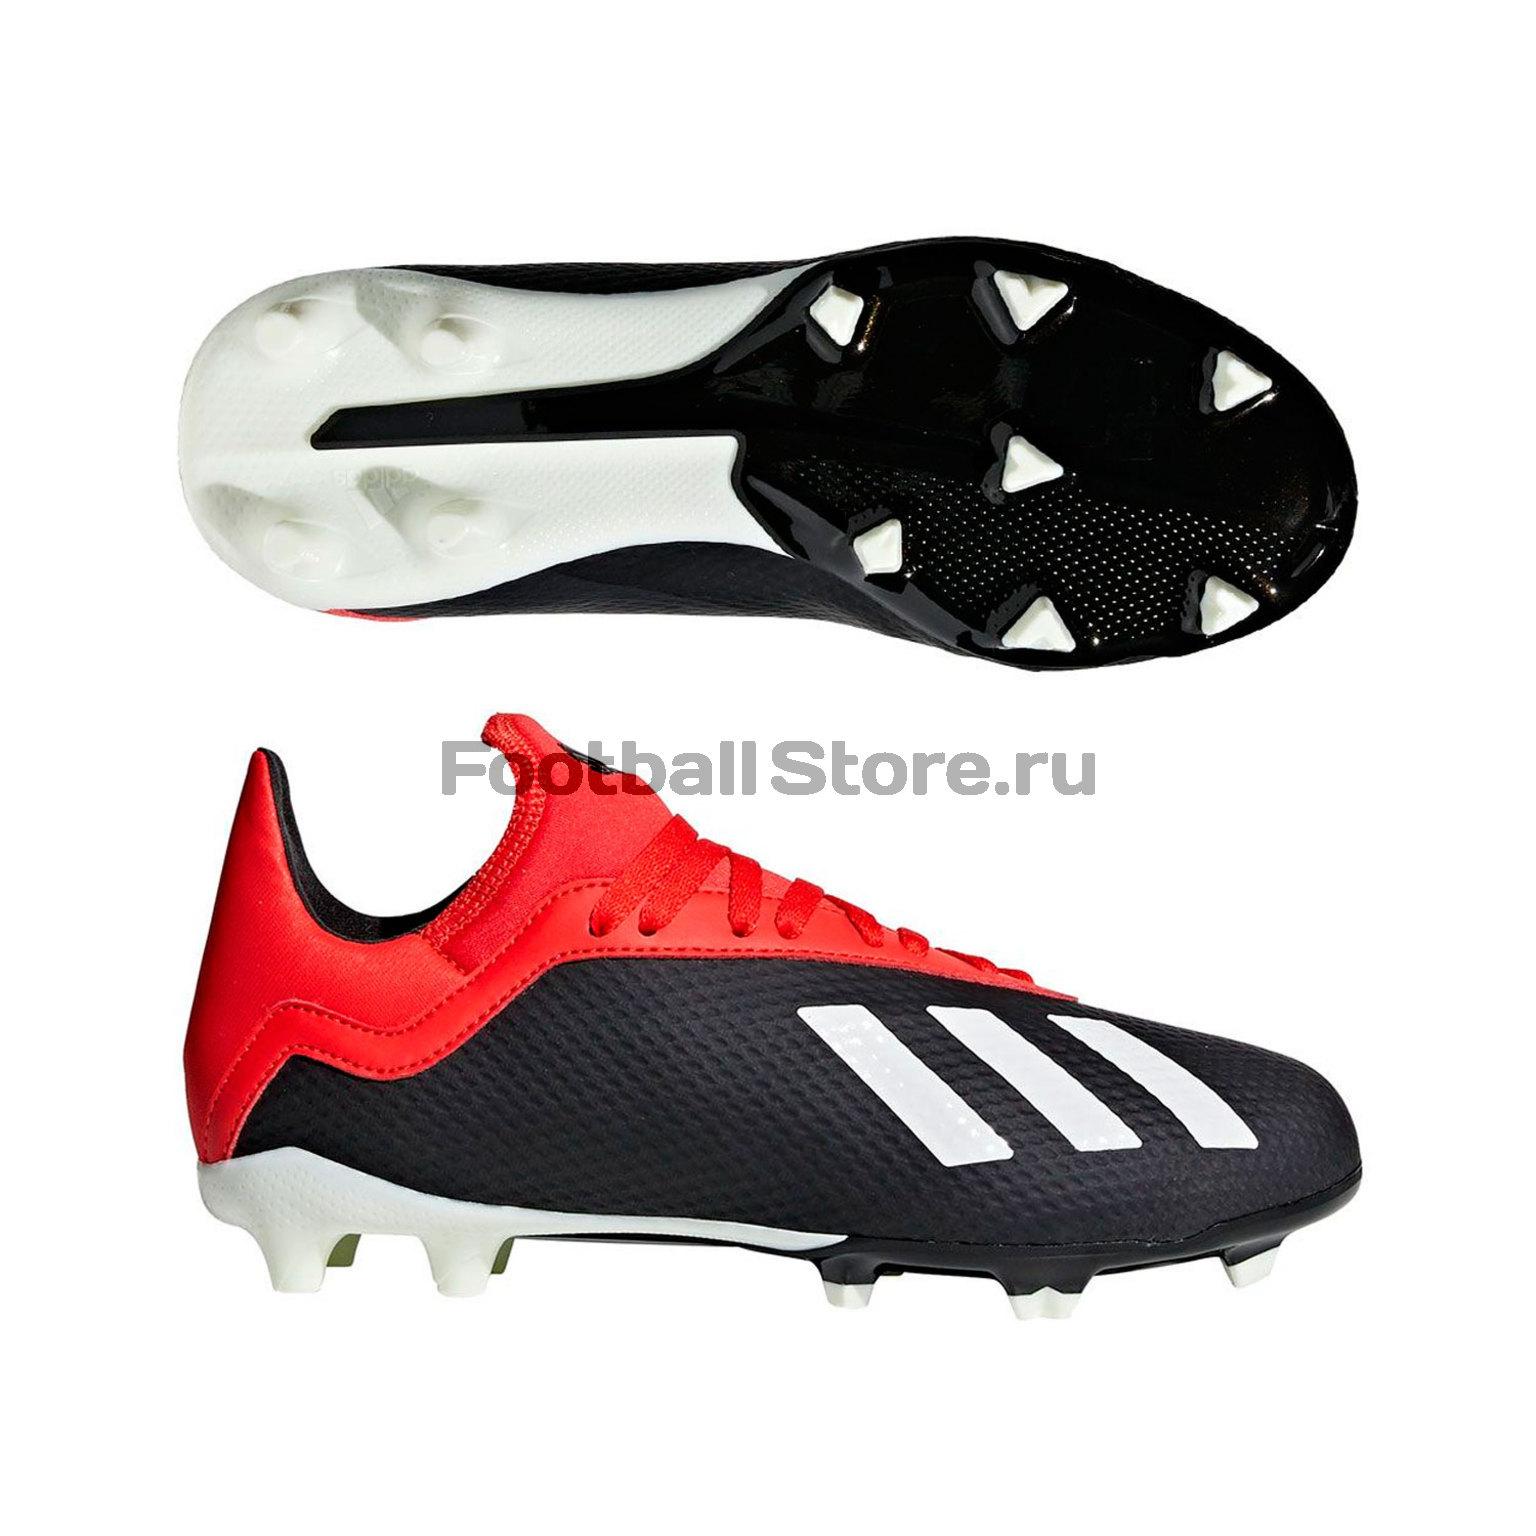 Бутсы детские Adidas X 18.3 FG BB9370 игровые бутсы adidas бутсы adidas ace 17 1 fg by2459